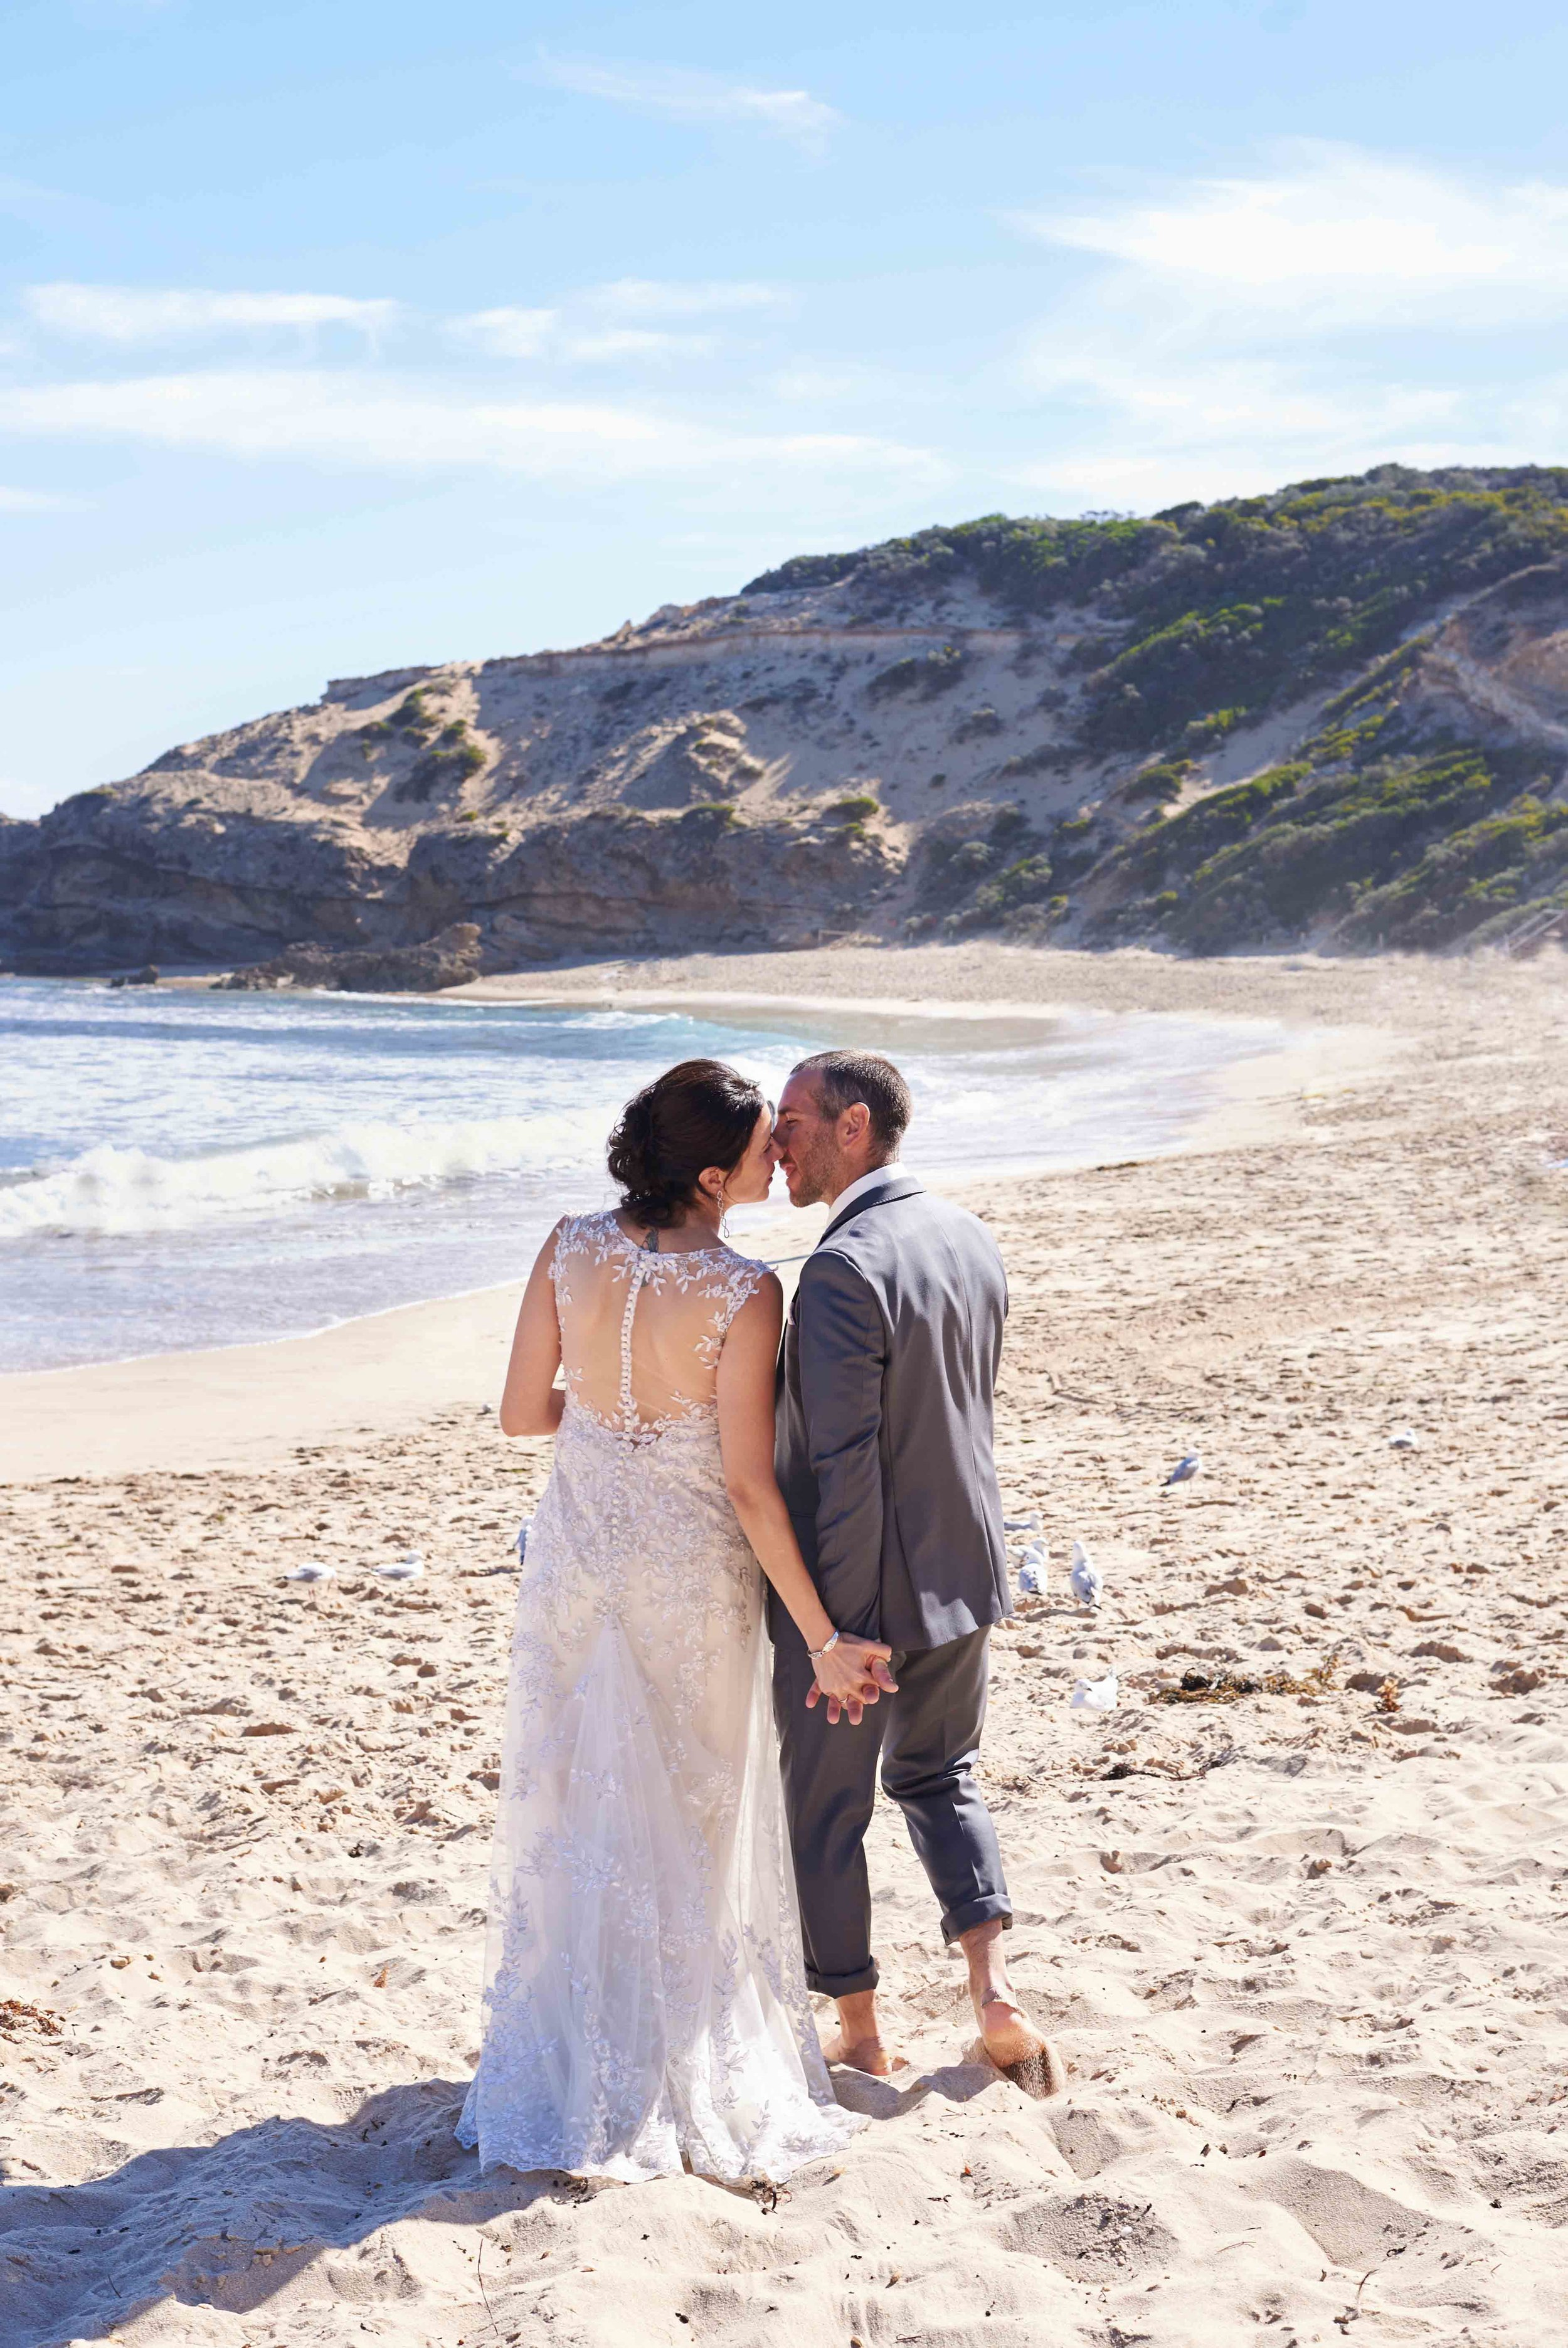 sorrento-wedding-photography-all-smiles-marissa-jade-photography-117.jpg